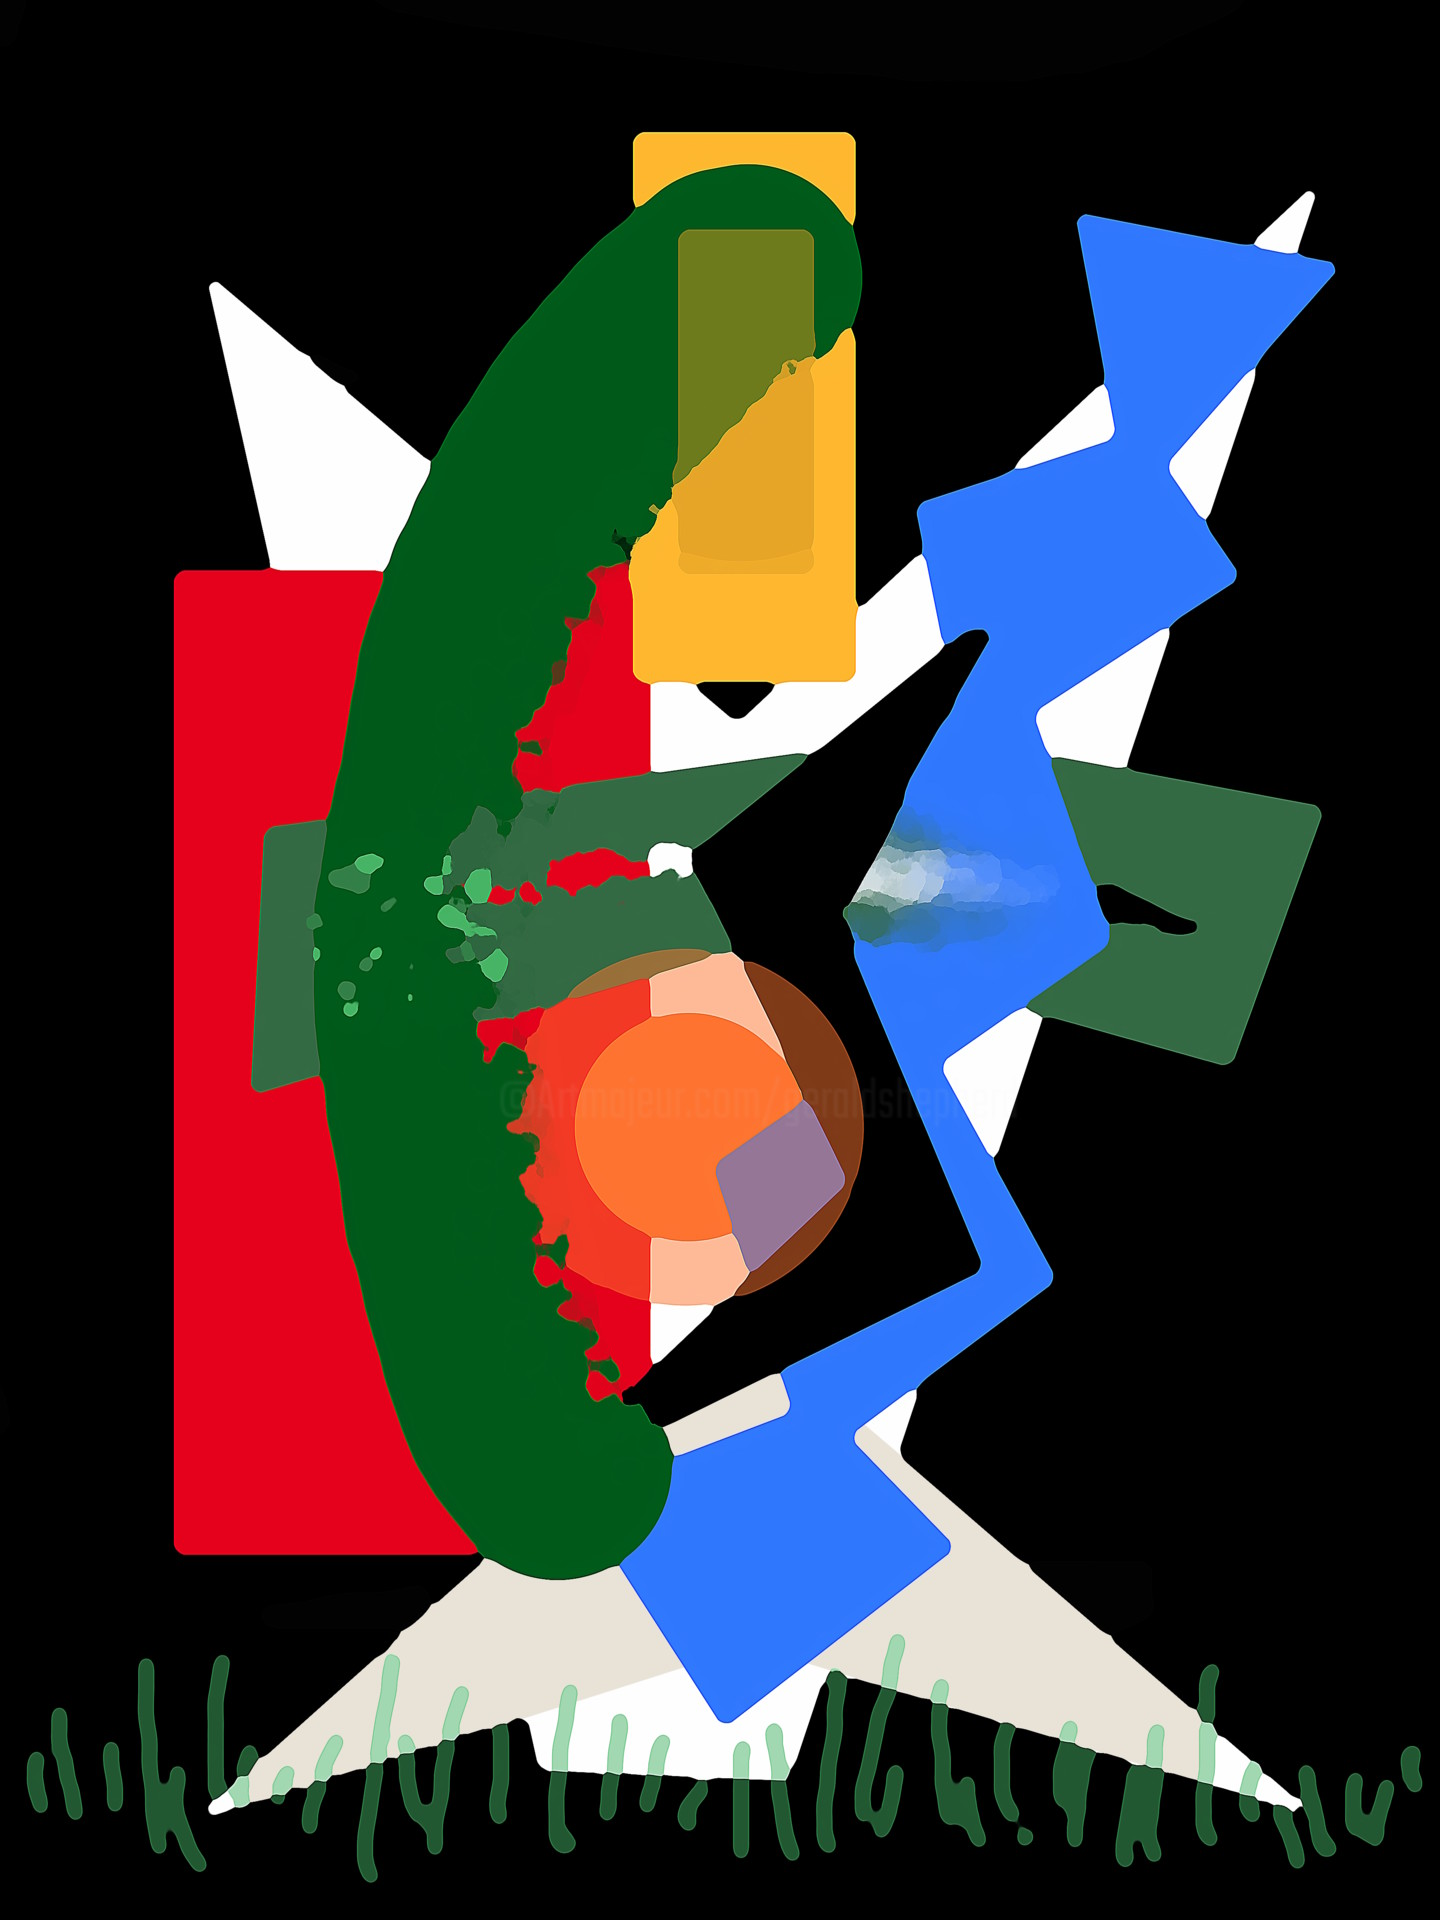 Gerald Shepherd - Playing With Poppy